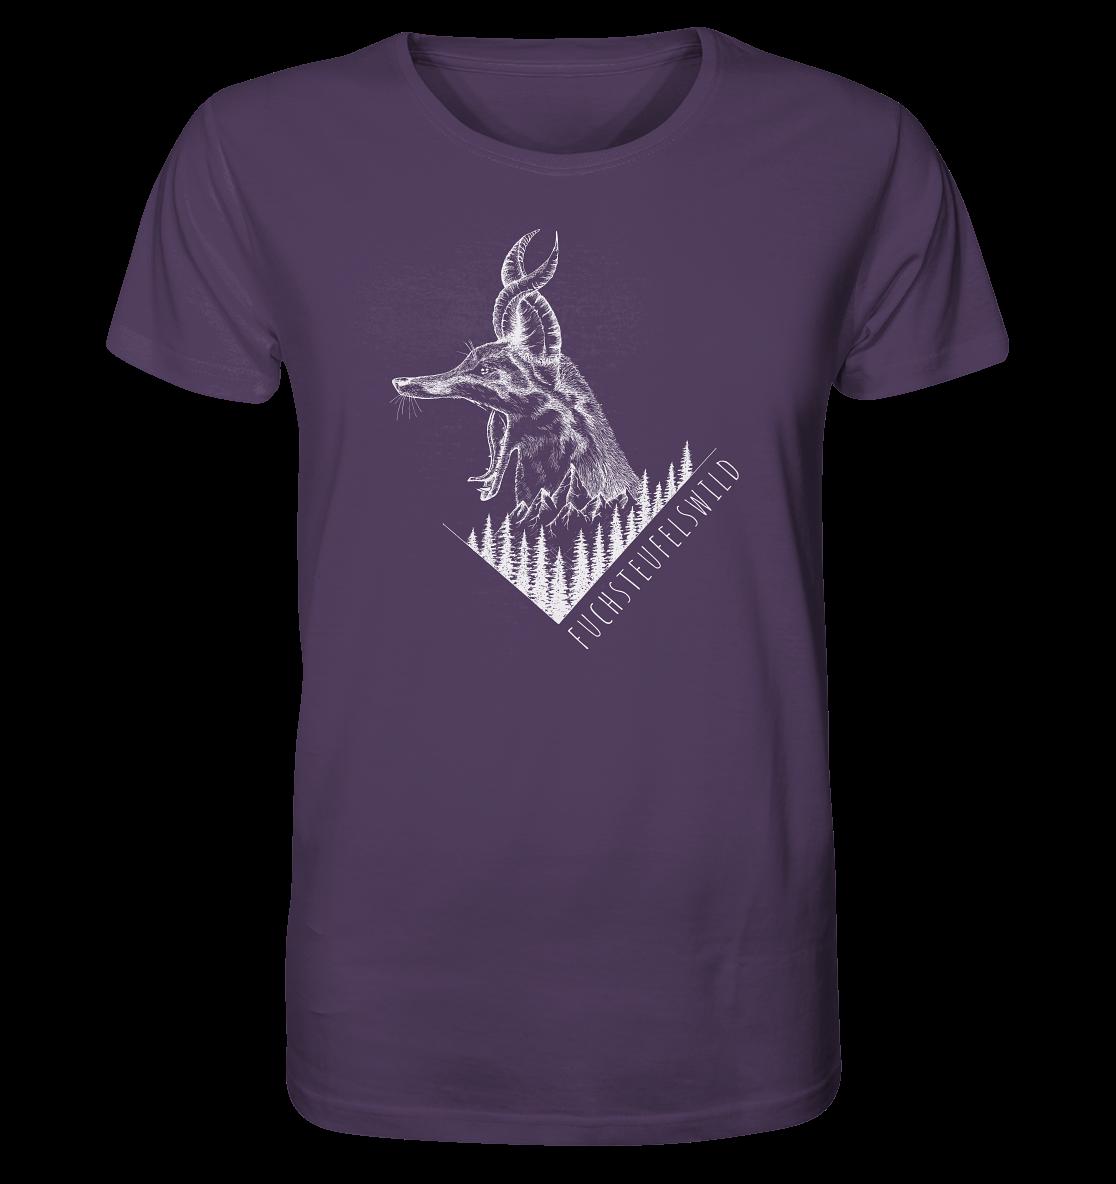 front-organic-shirt-523f5f-1116x-3.png